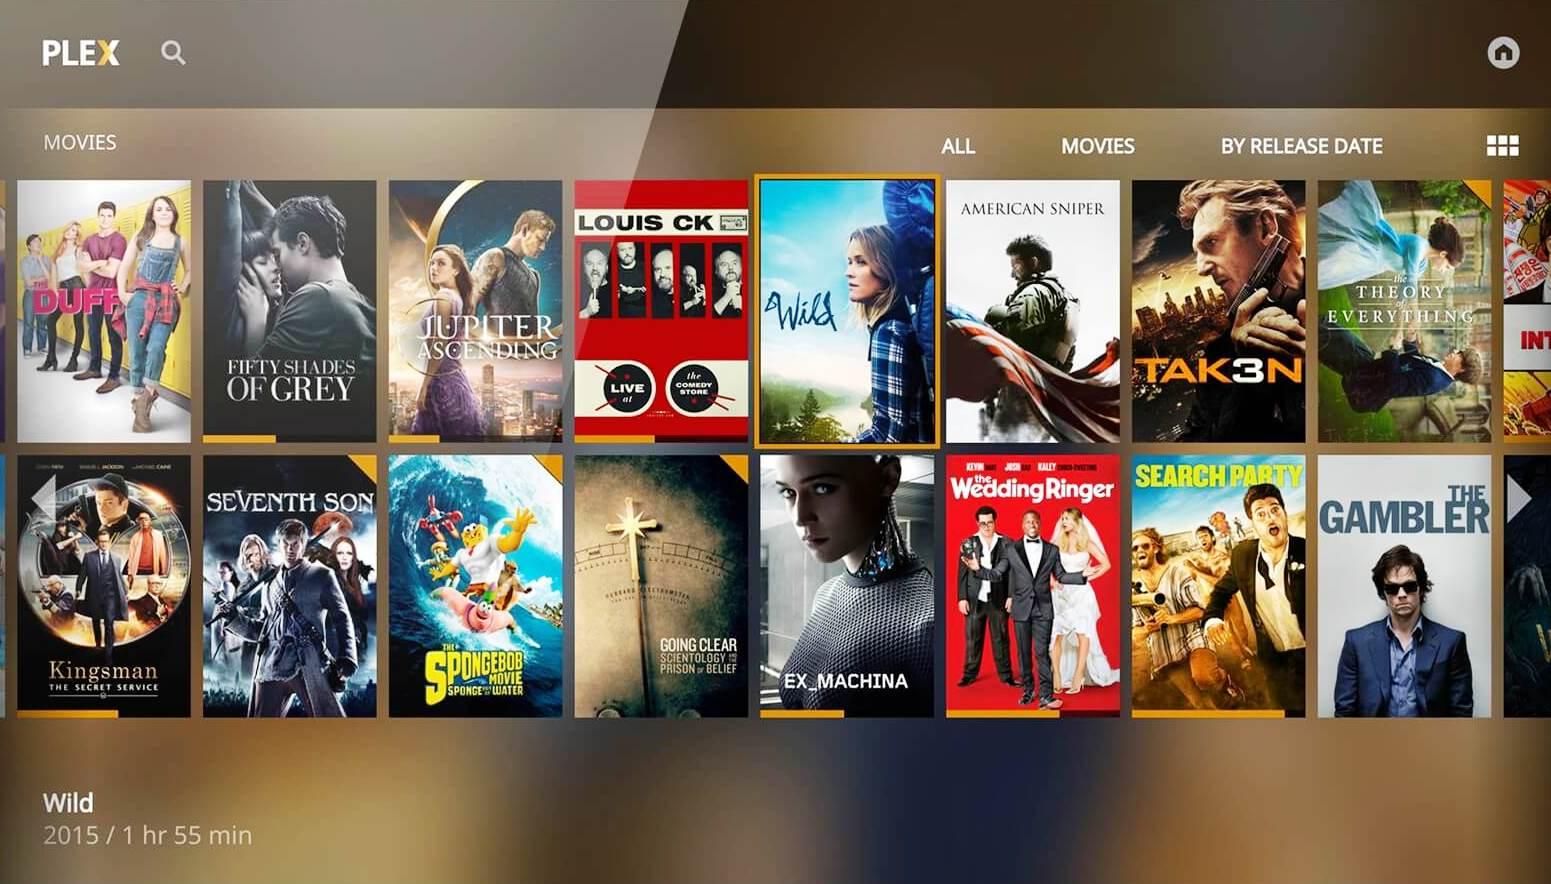 Stream Live TV with Plex TV: Plex TV Becomes a Low-Cost DIY